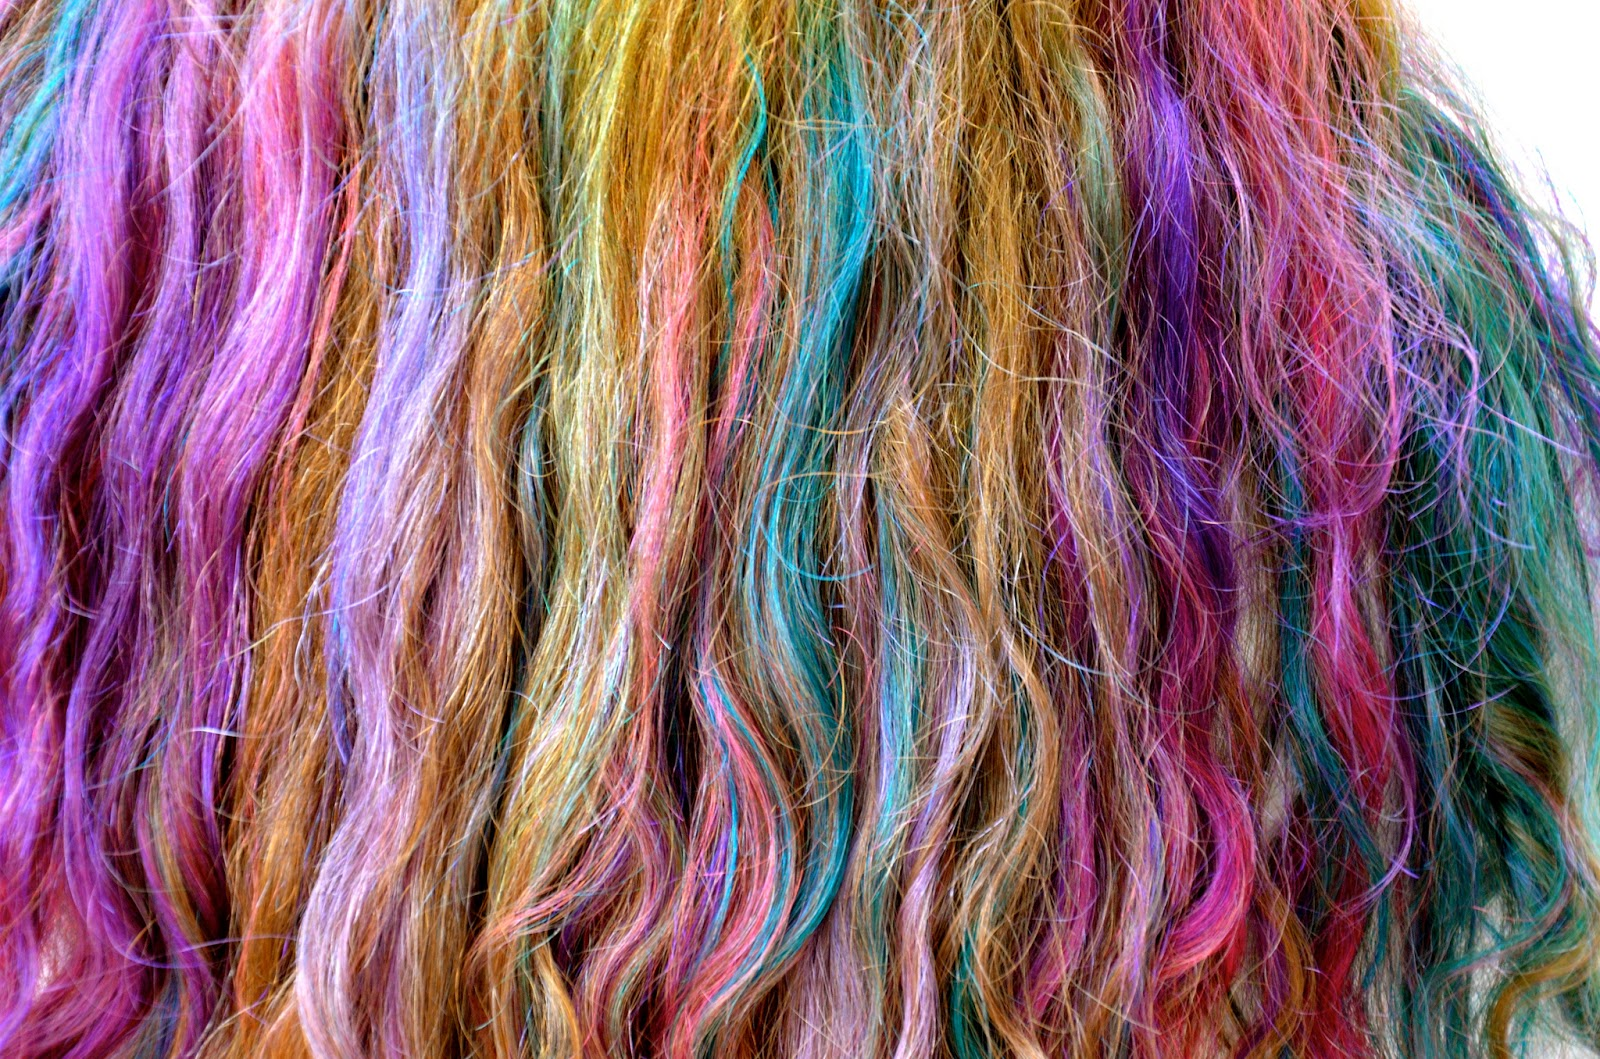 Hukum Mewarnai Rambut Bagi Pemuda Yang Belum Beruban  b159f0f9ec